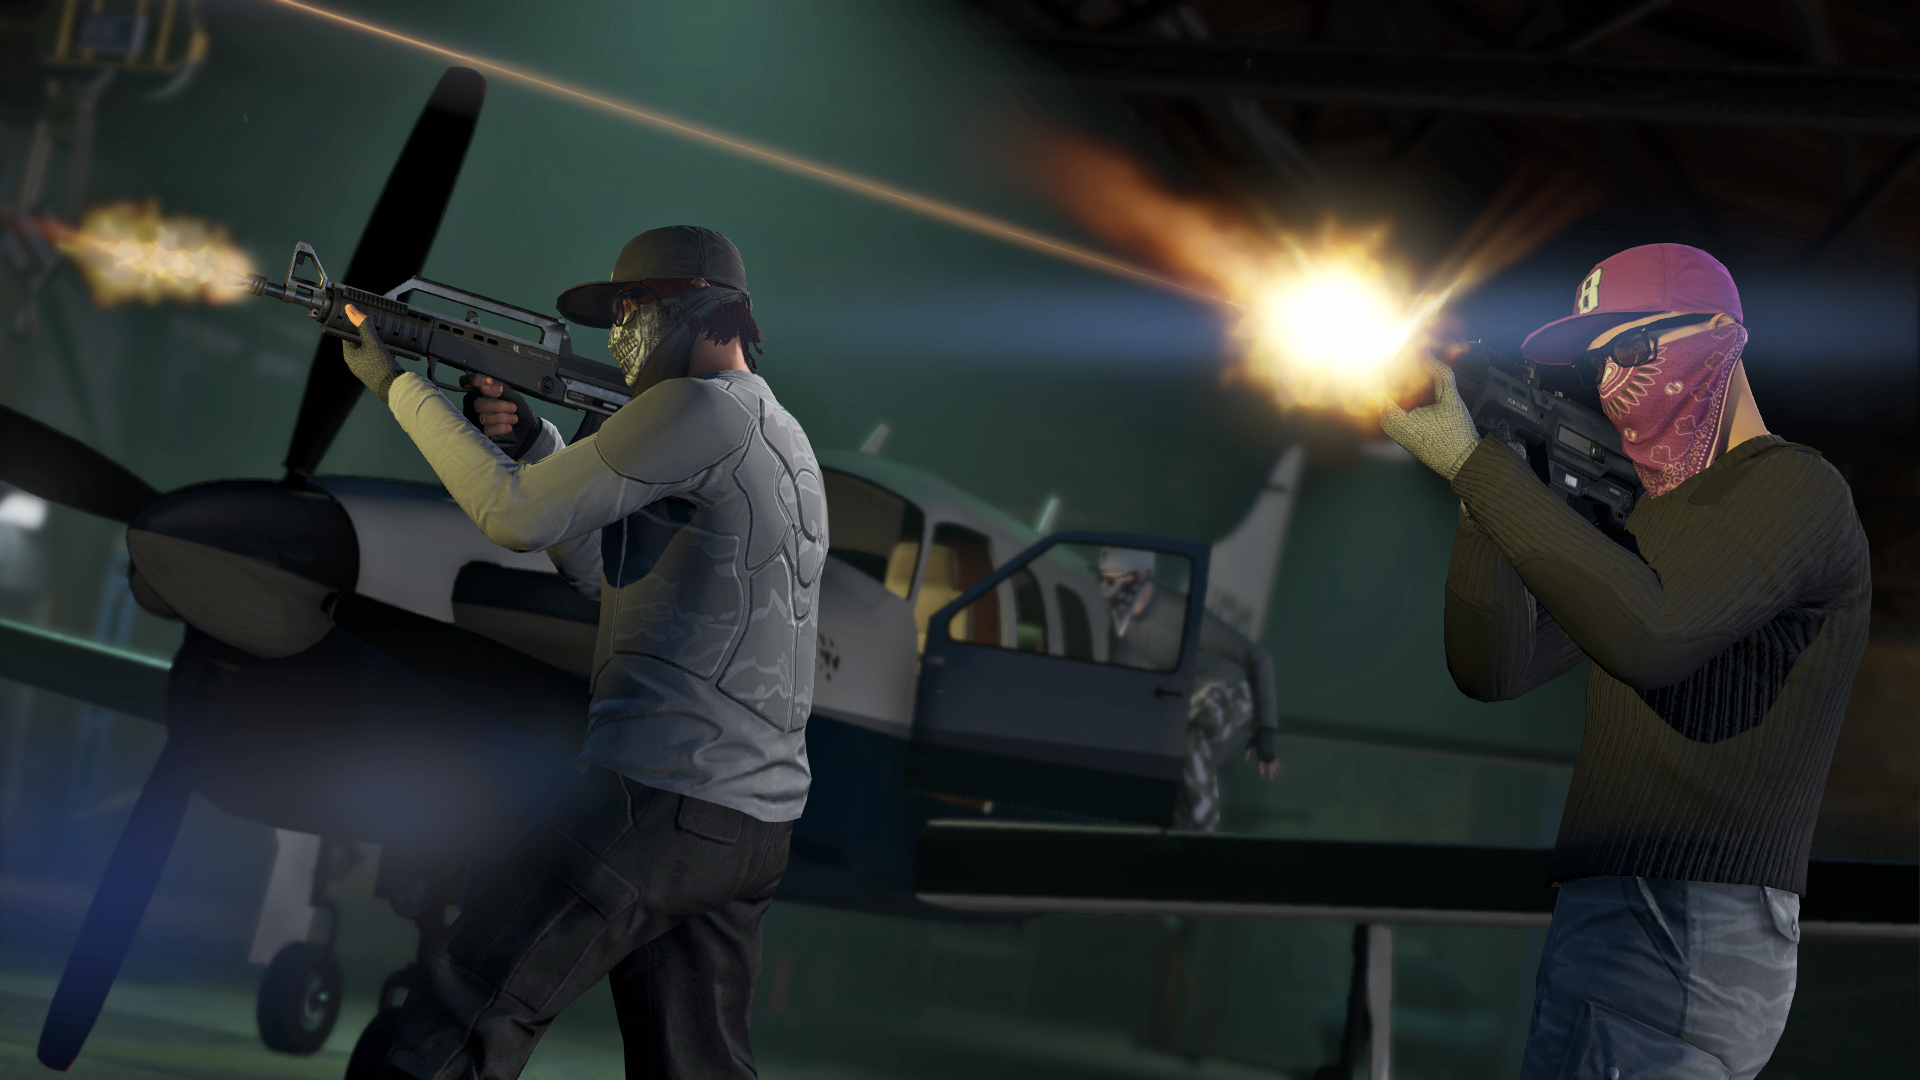 GTAV Updates: Online Heists Coming March 10, GTAV for PC